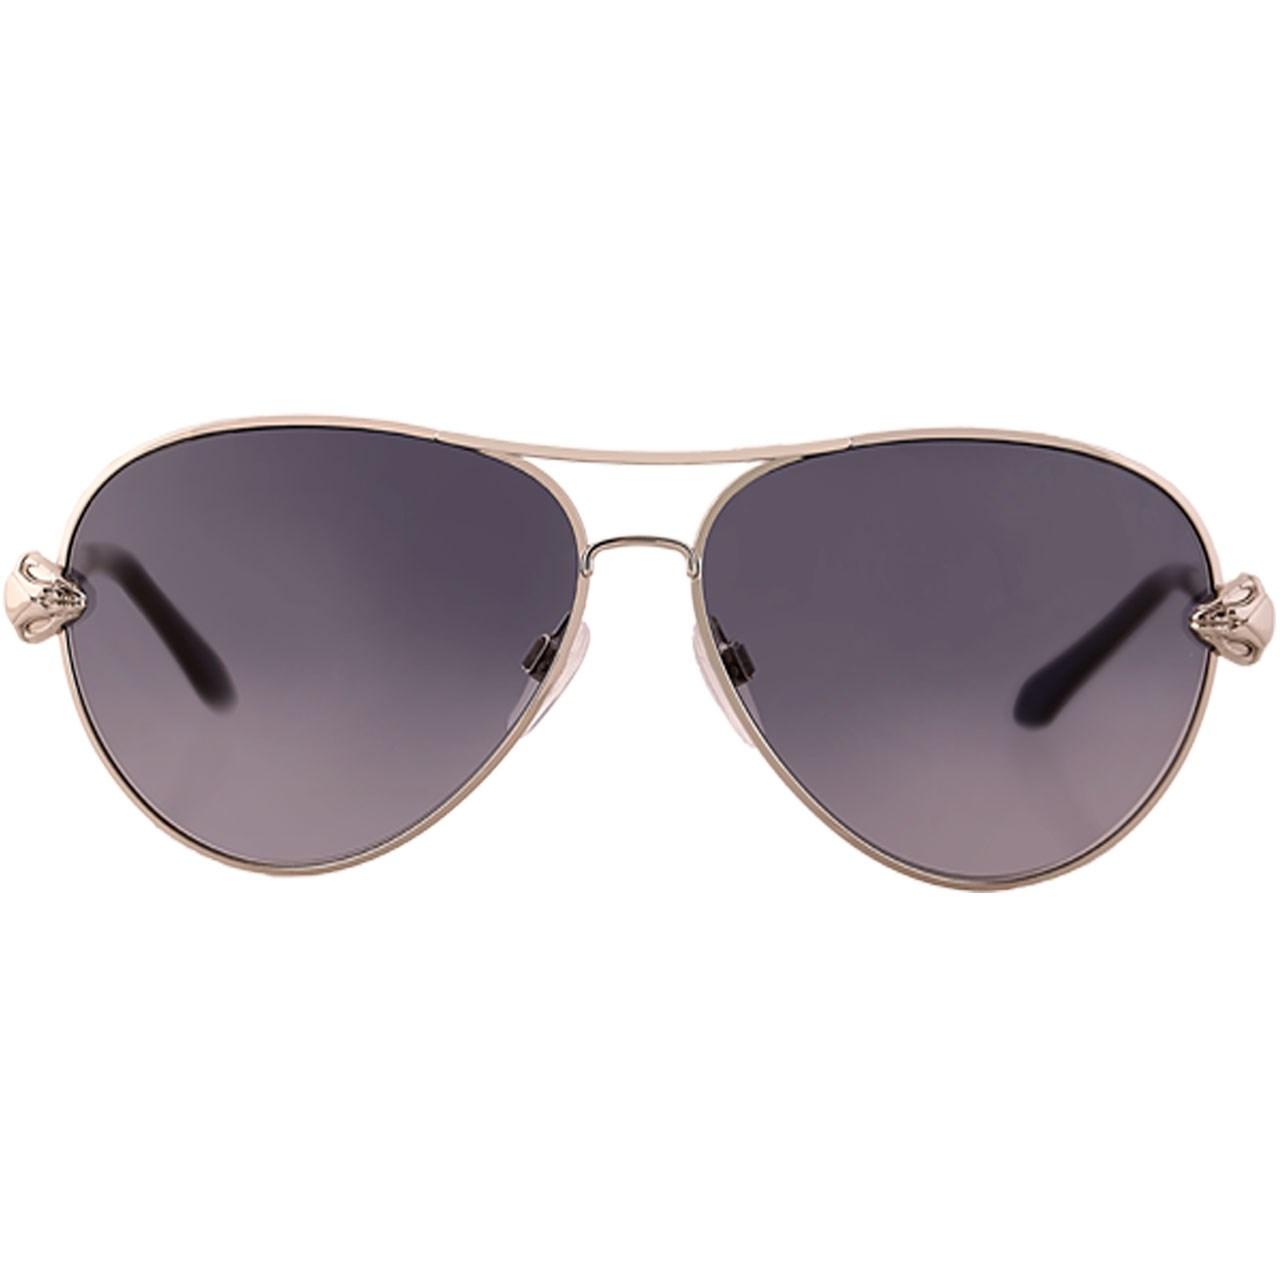 عینک آفتابی روبرتو کاوالی مدل 884S-16B